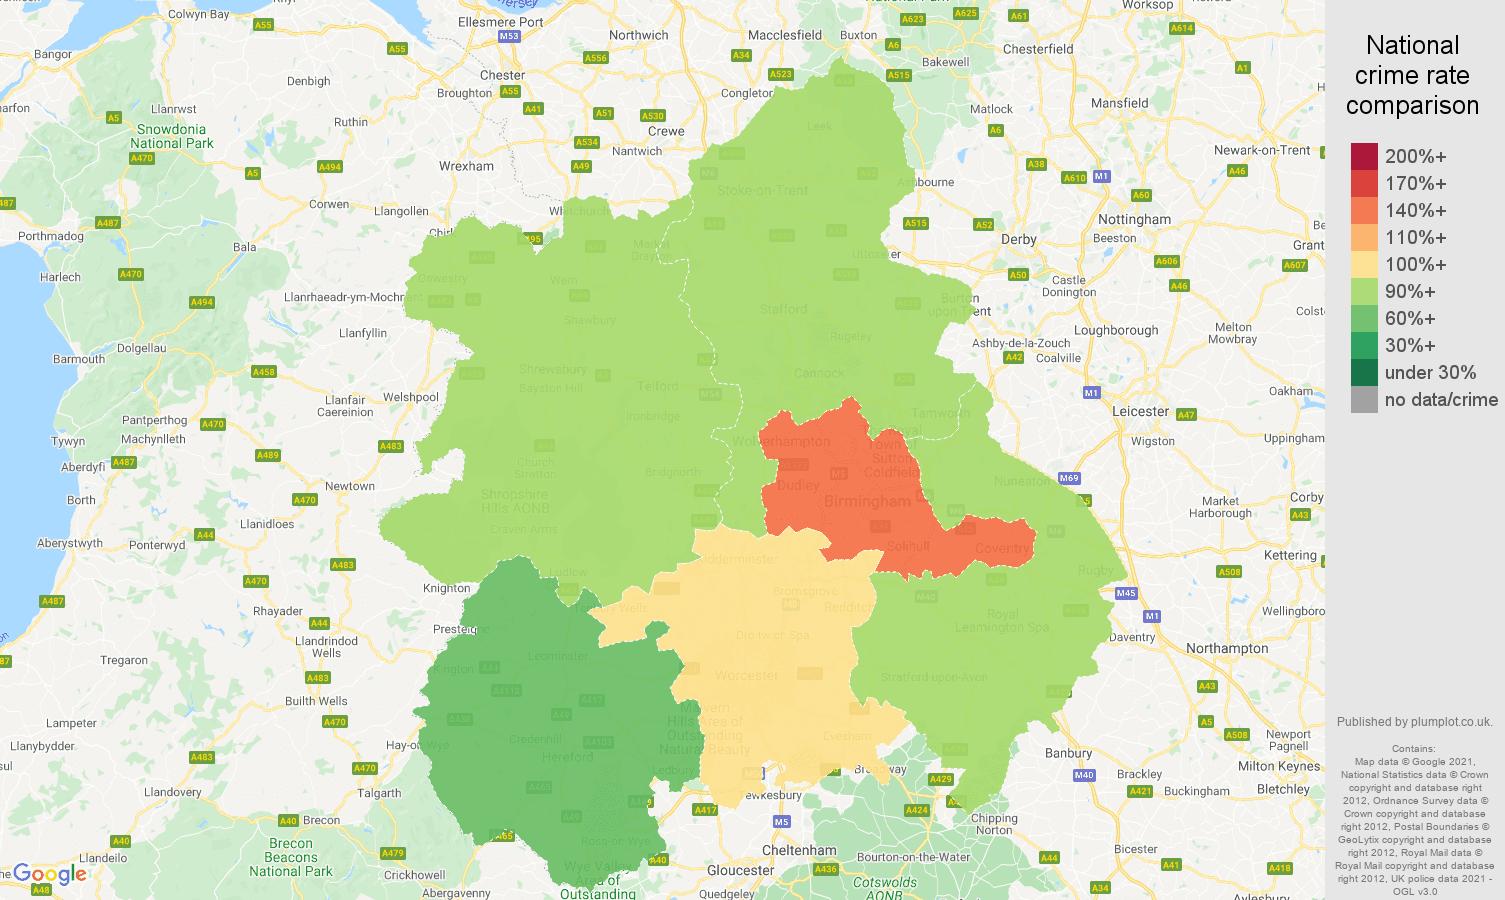 West Midlands violent crime rate comparison map